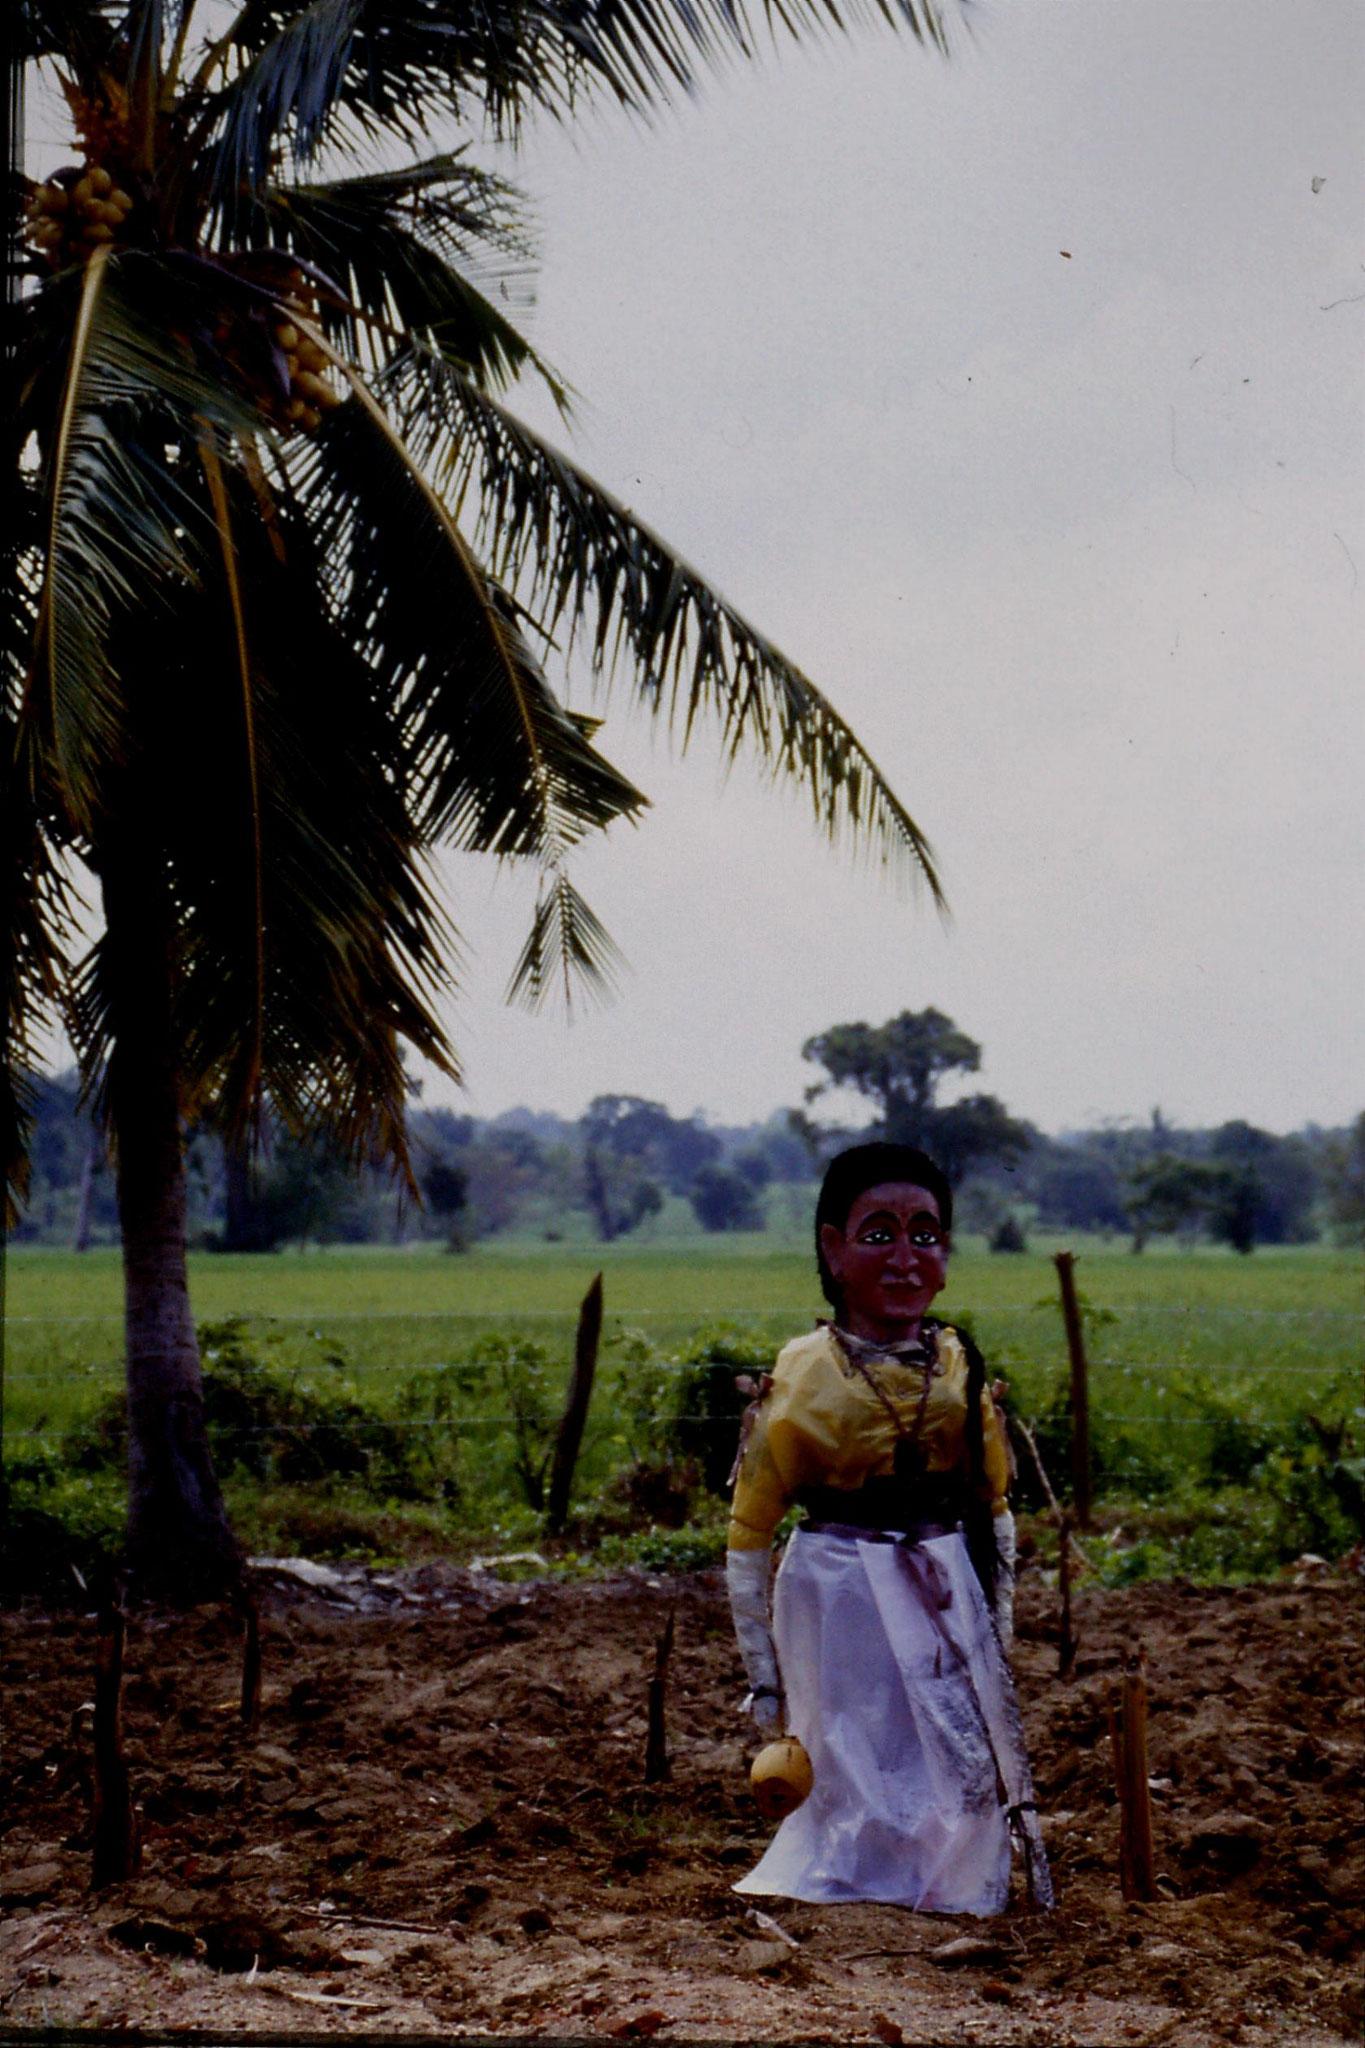 7/2/1990: 32: Giritale 'elegant' scarecrow